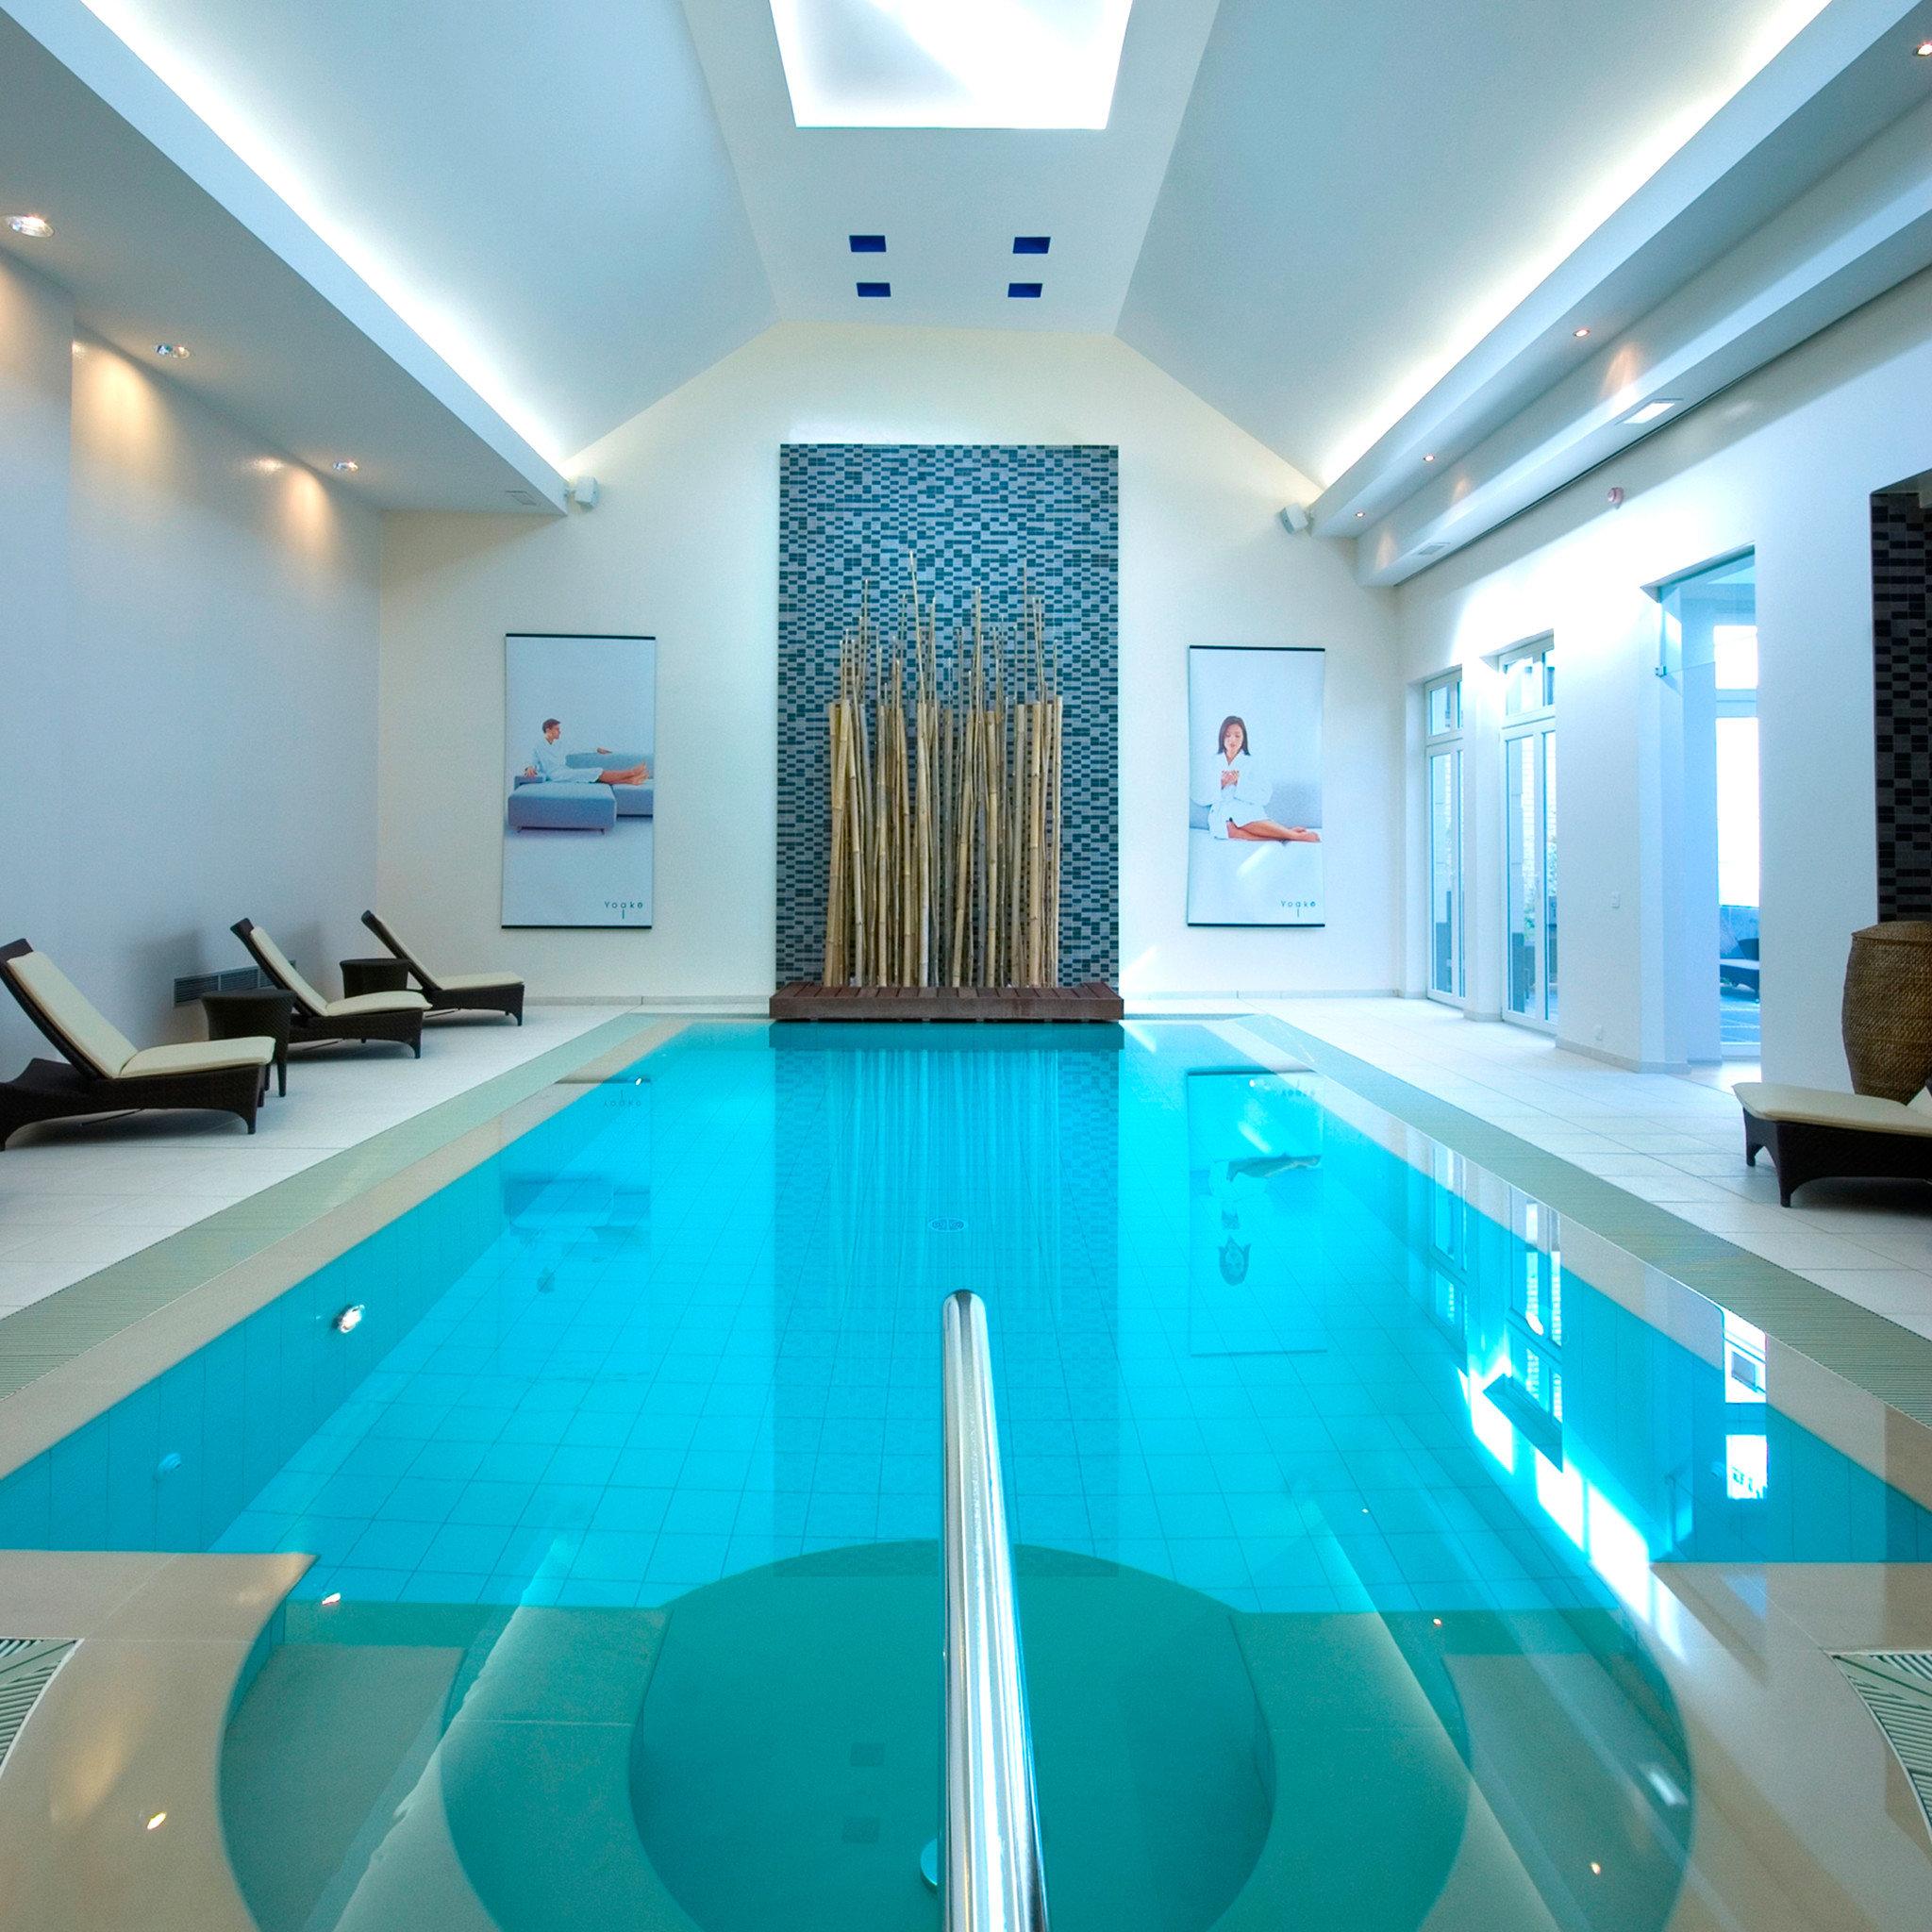 Hip Lounge Luxury Modern Pool swimming pool property blue